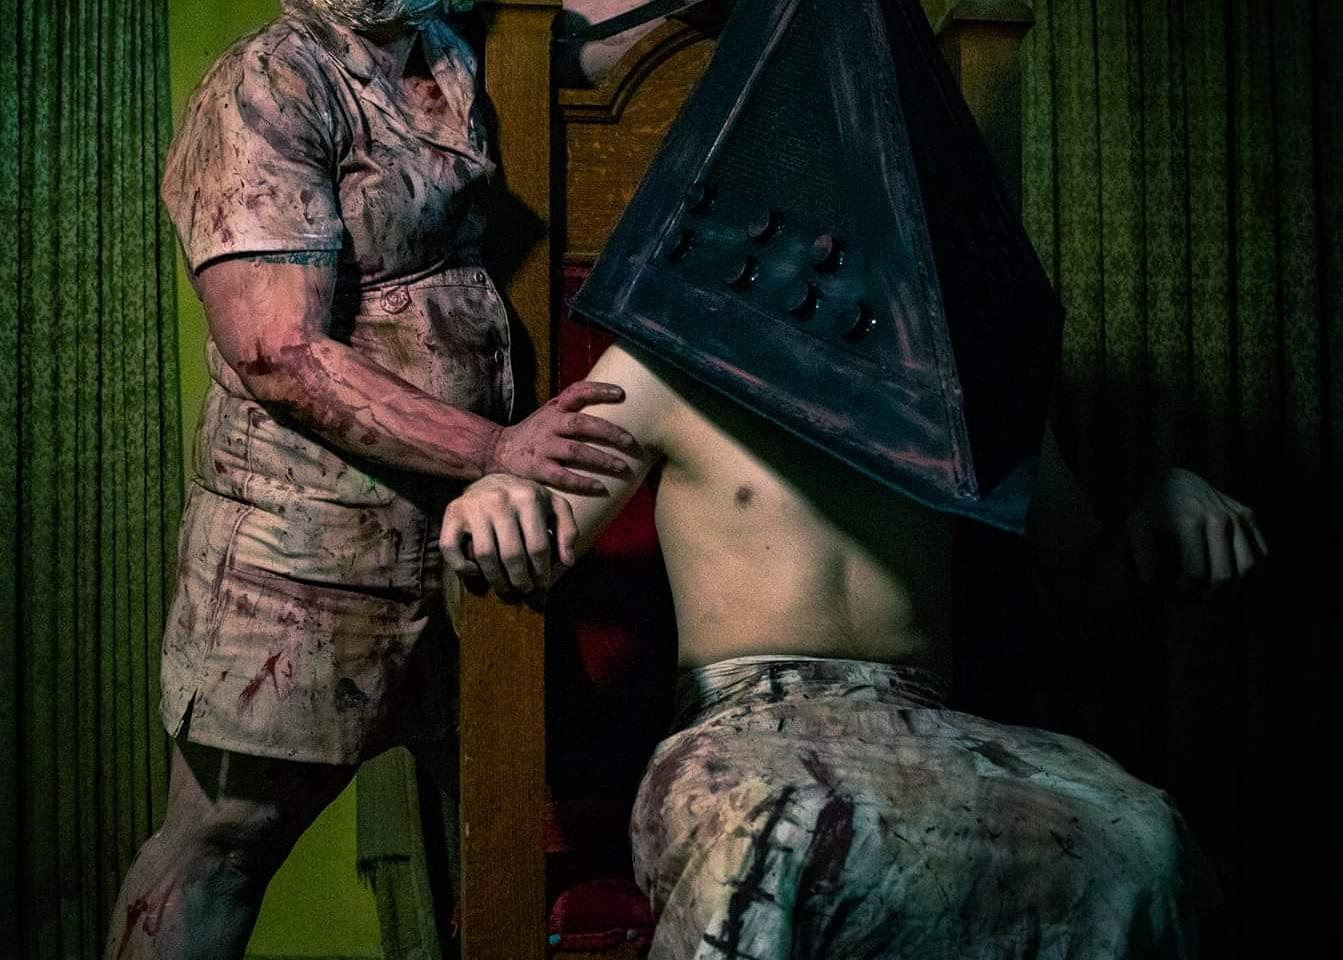 Silent Hill Nurse + Pyramid Head